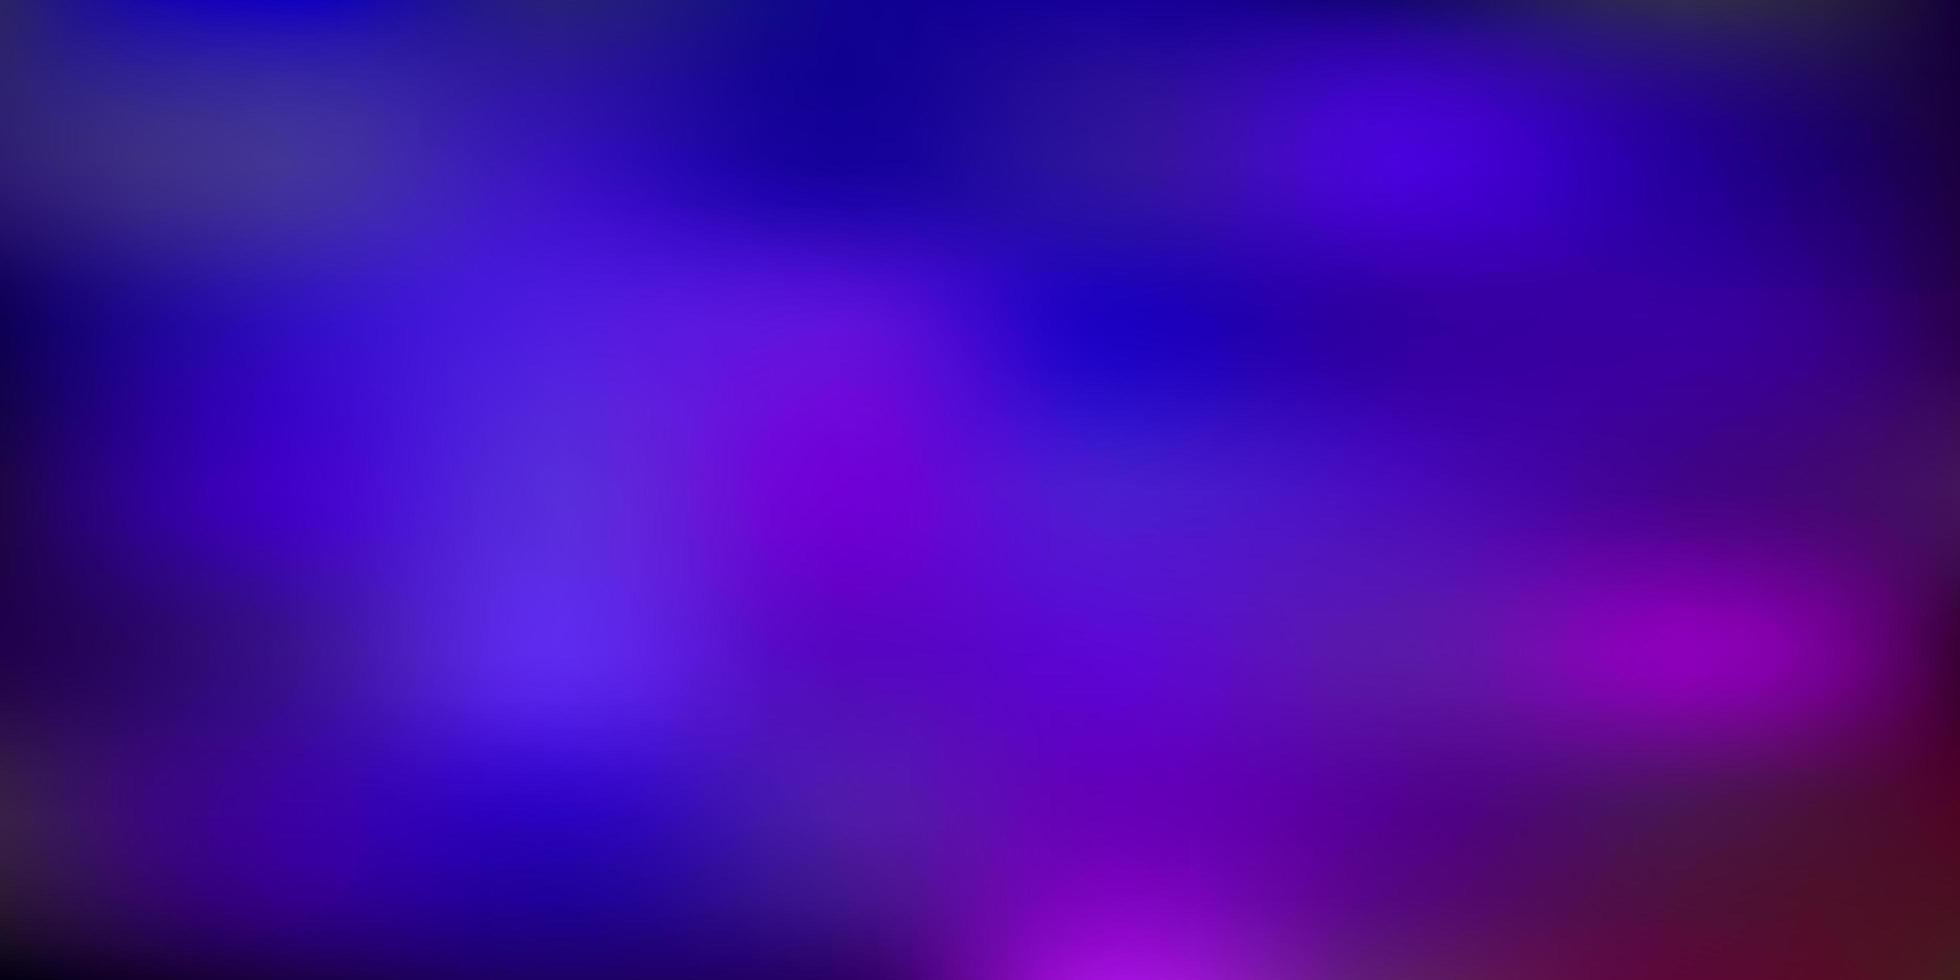 Dibujo de desenfoque abstracto de vector azul oscuro, rojo.